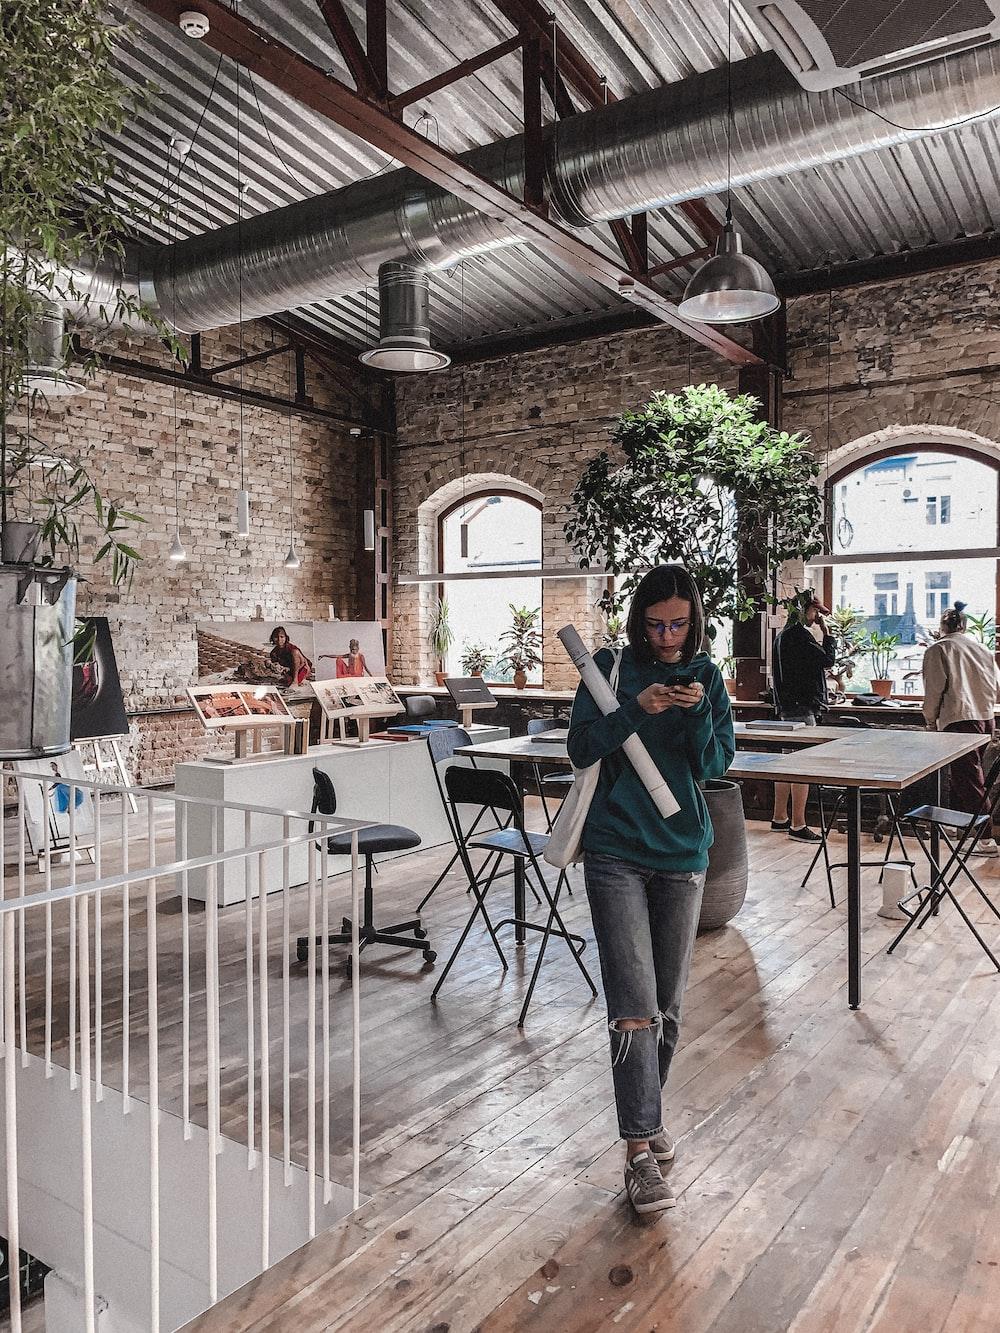 woman holding smartphone walking near table inside building